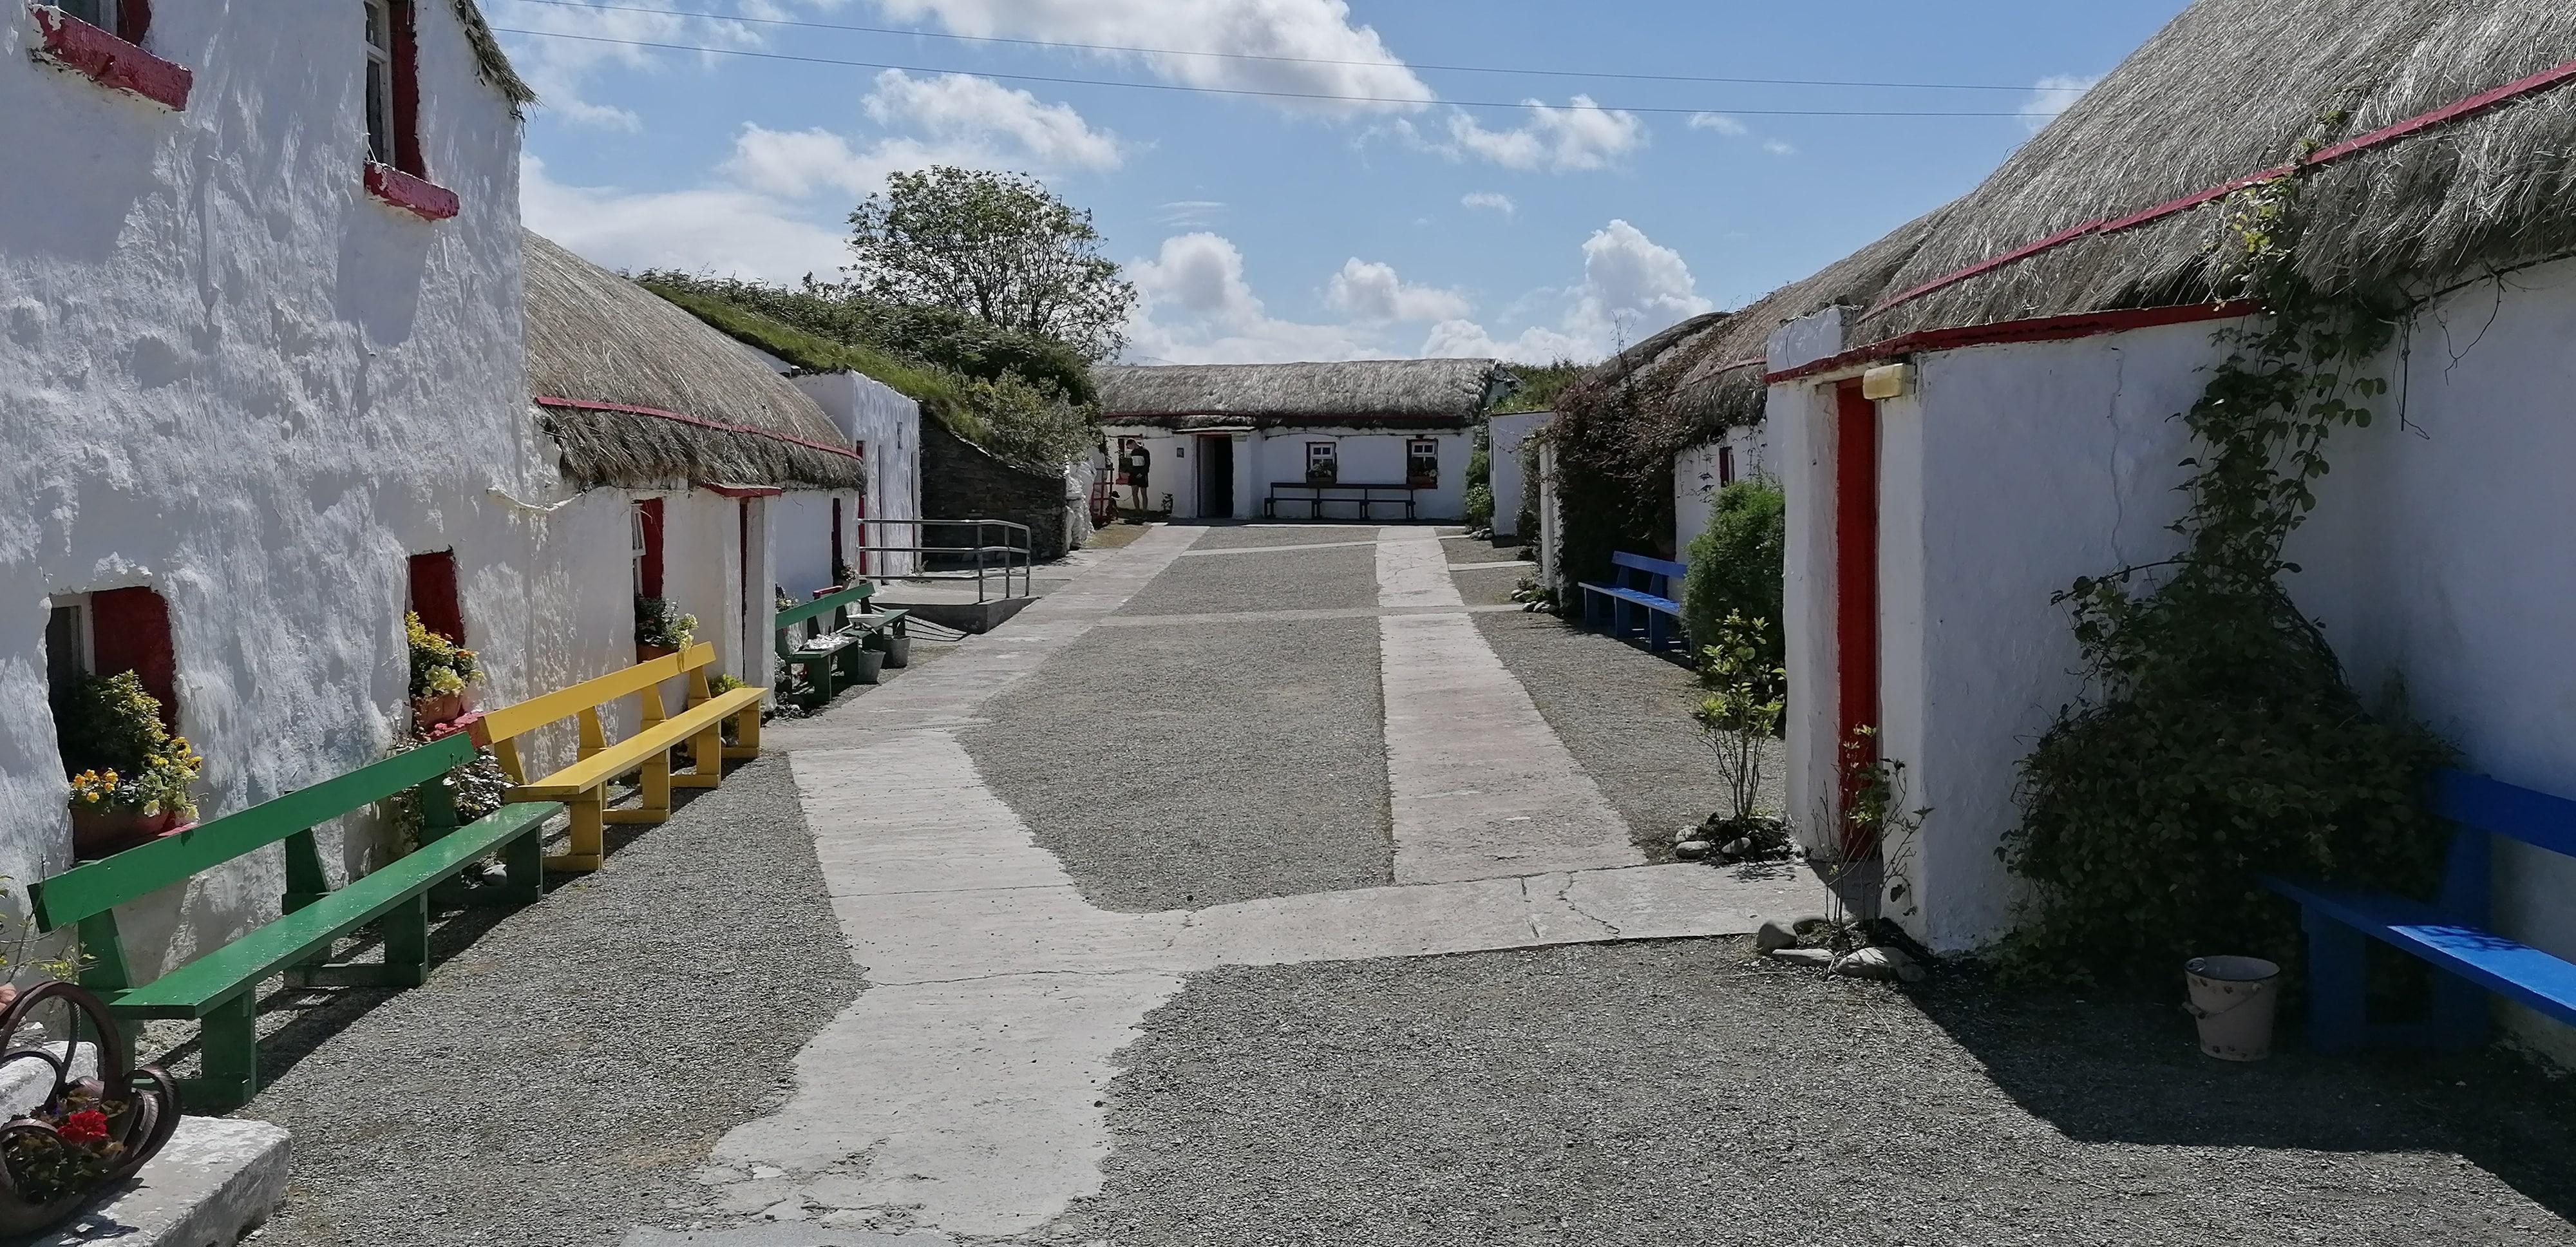 Doagh Visitors Center